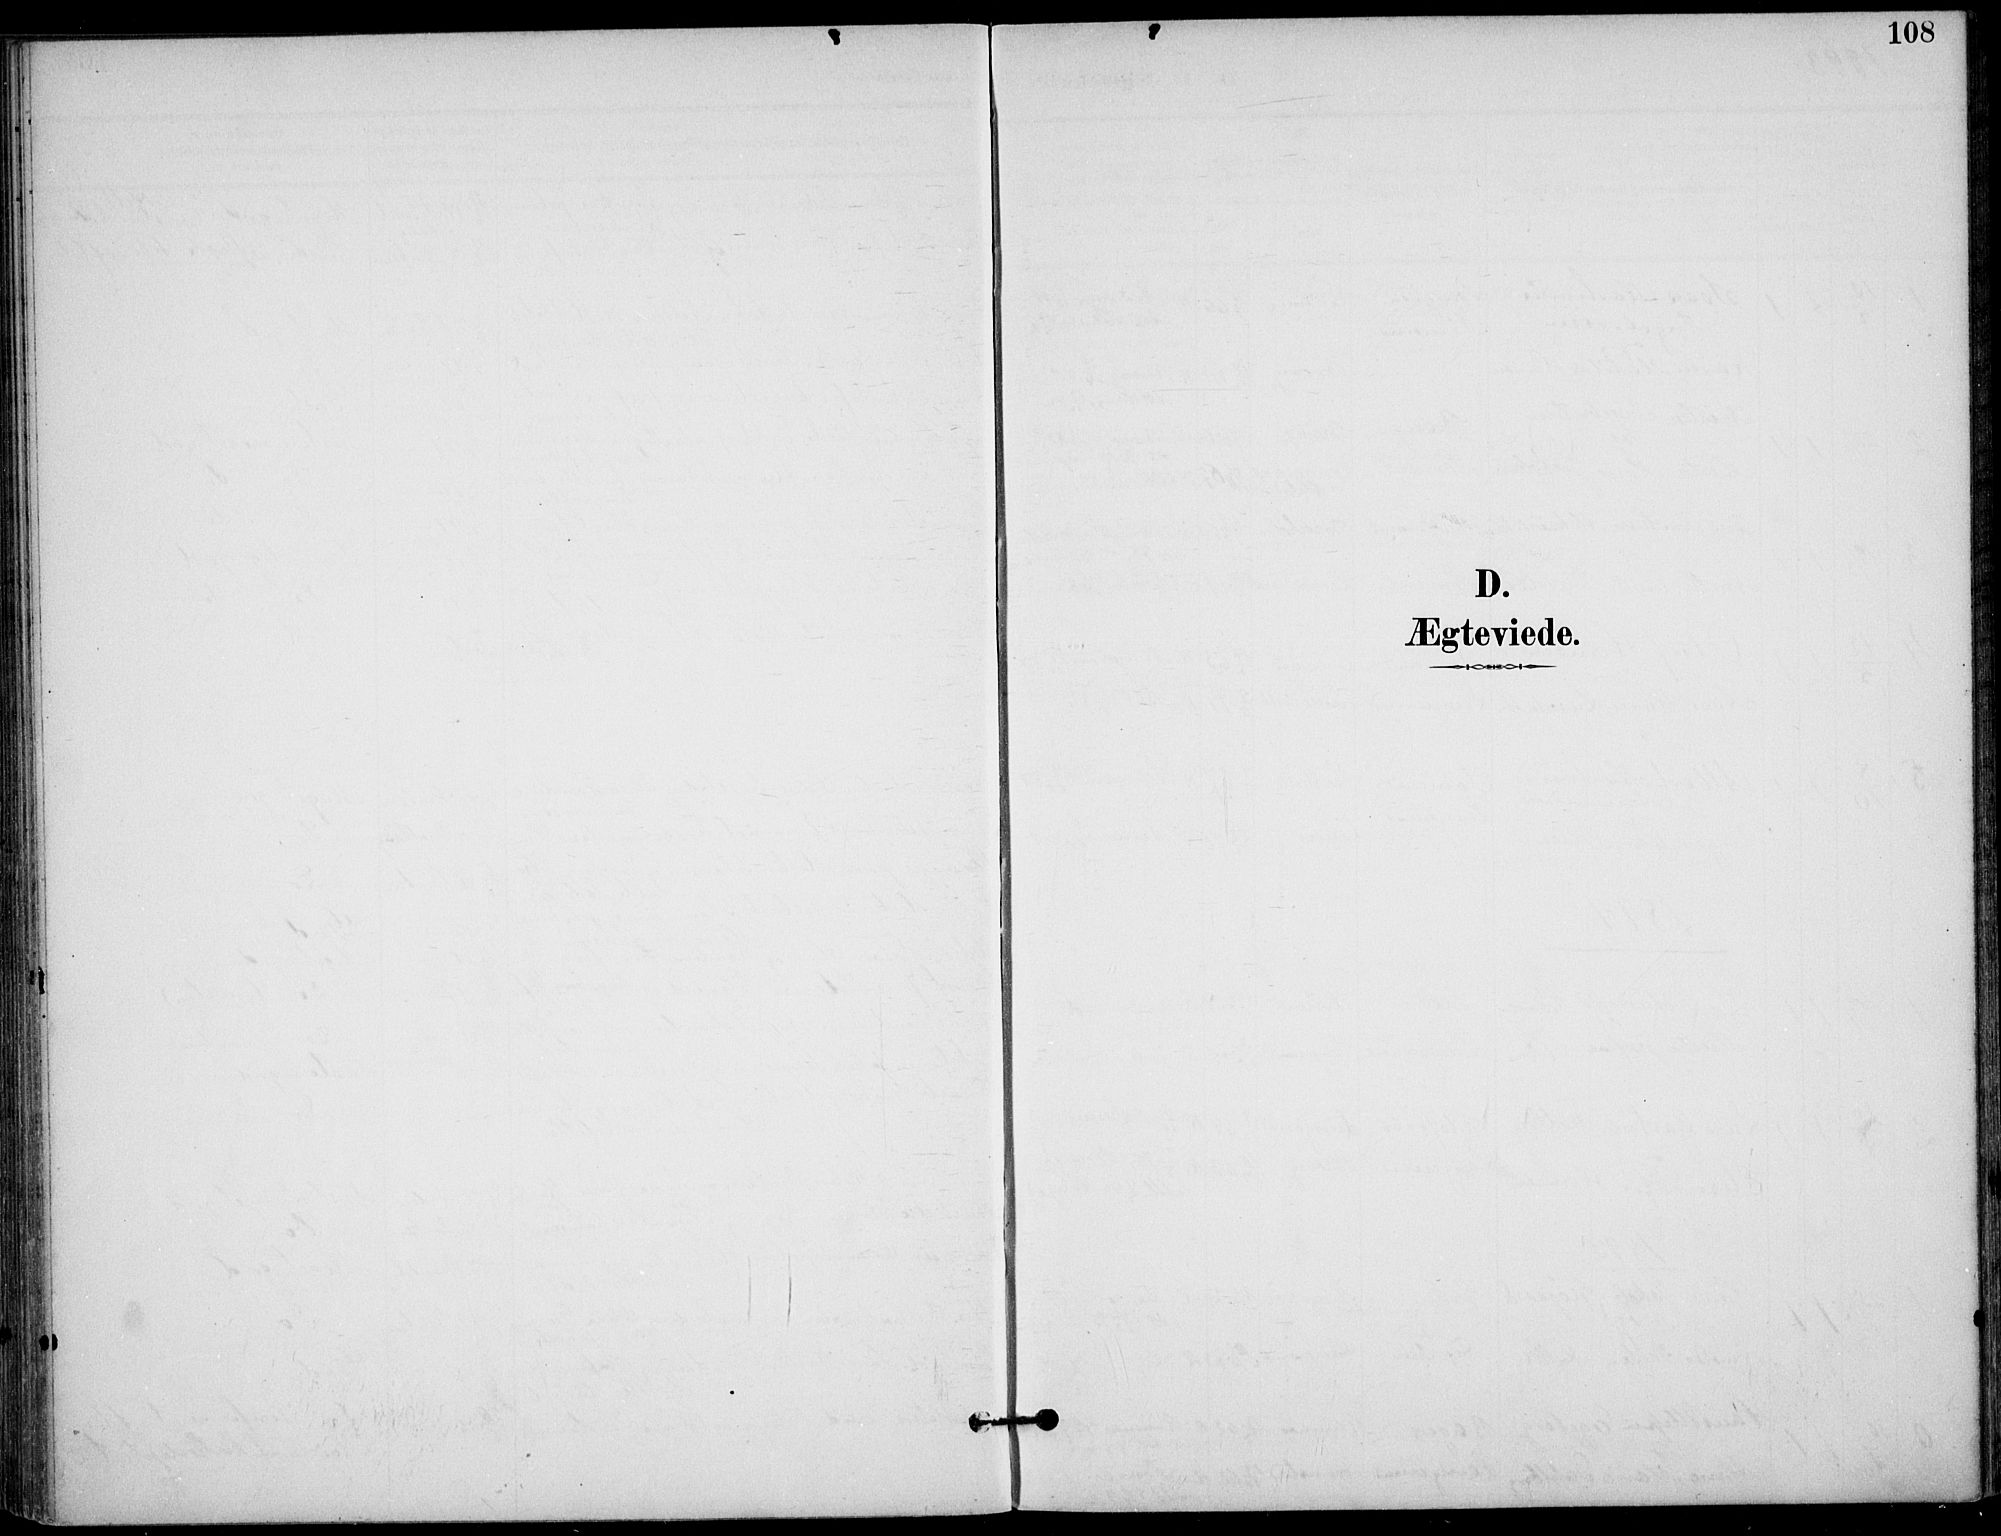 SAKO, Langesund kirkebøker, F/Fa/L0003: Ministerialbok nr. 3, 1893-1907, s. 108